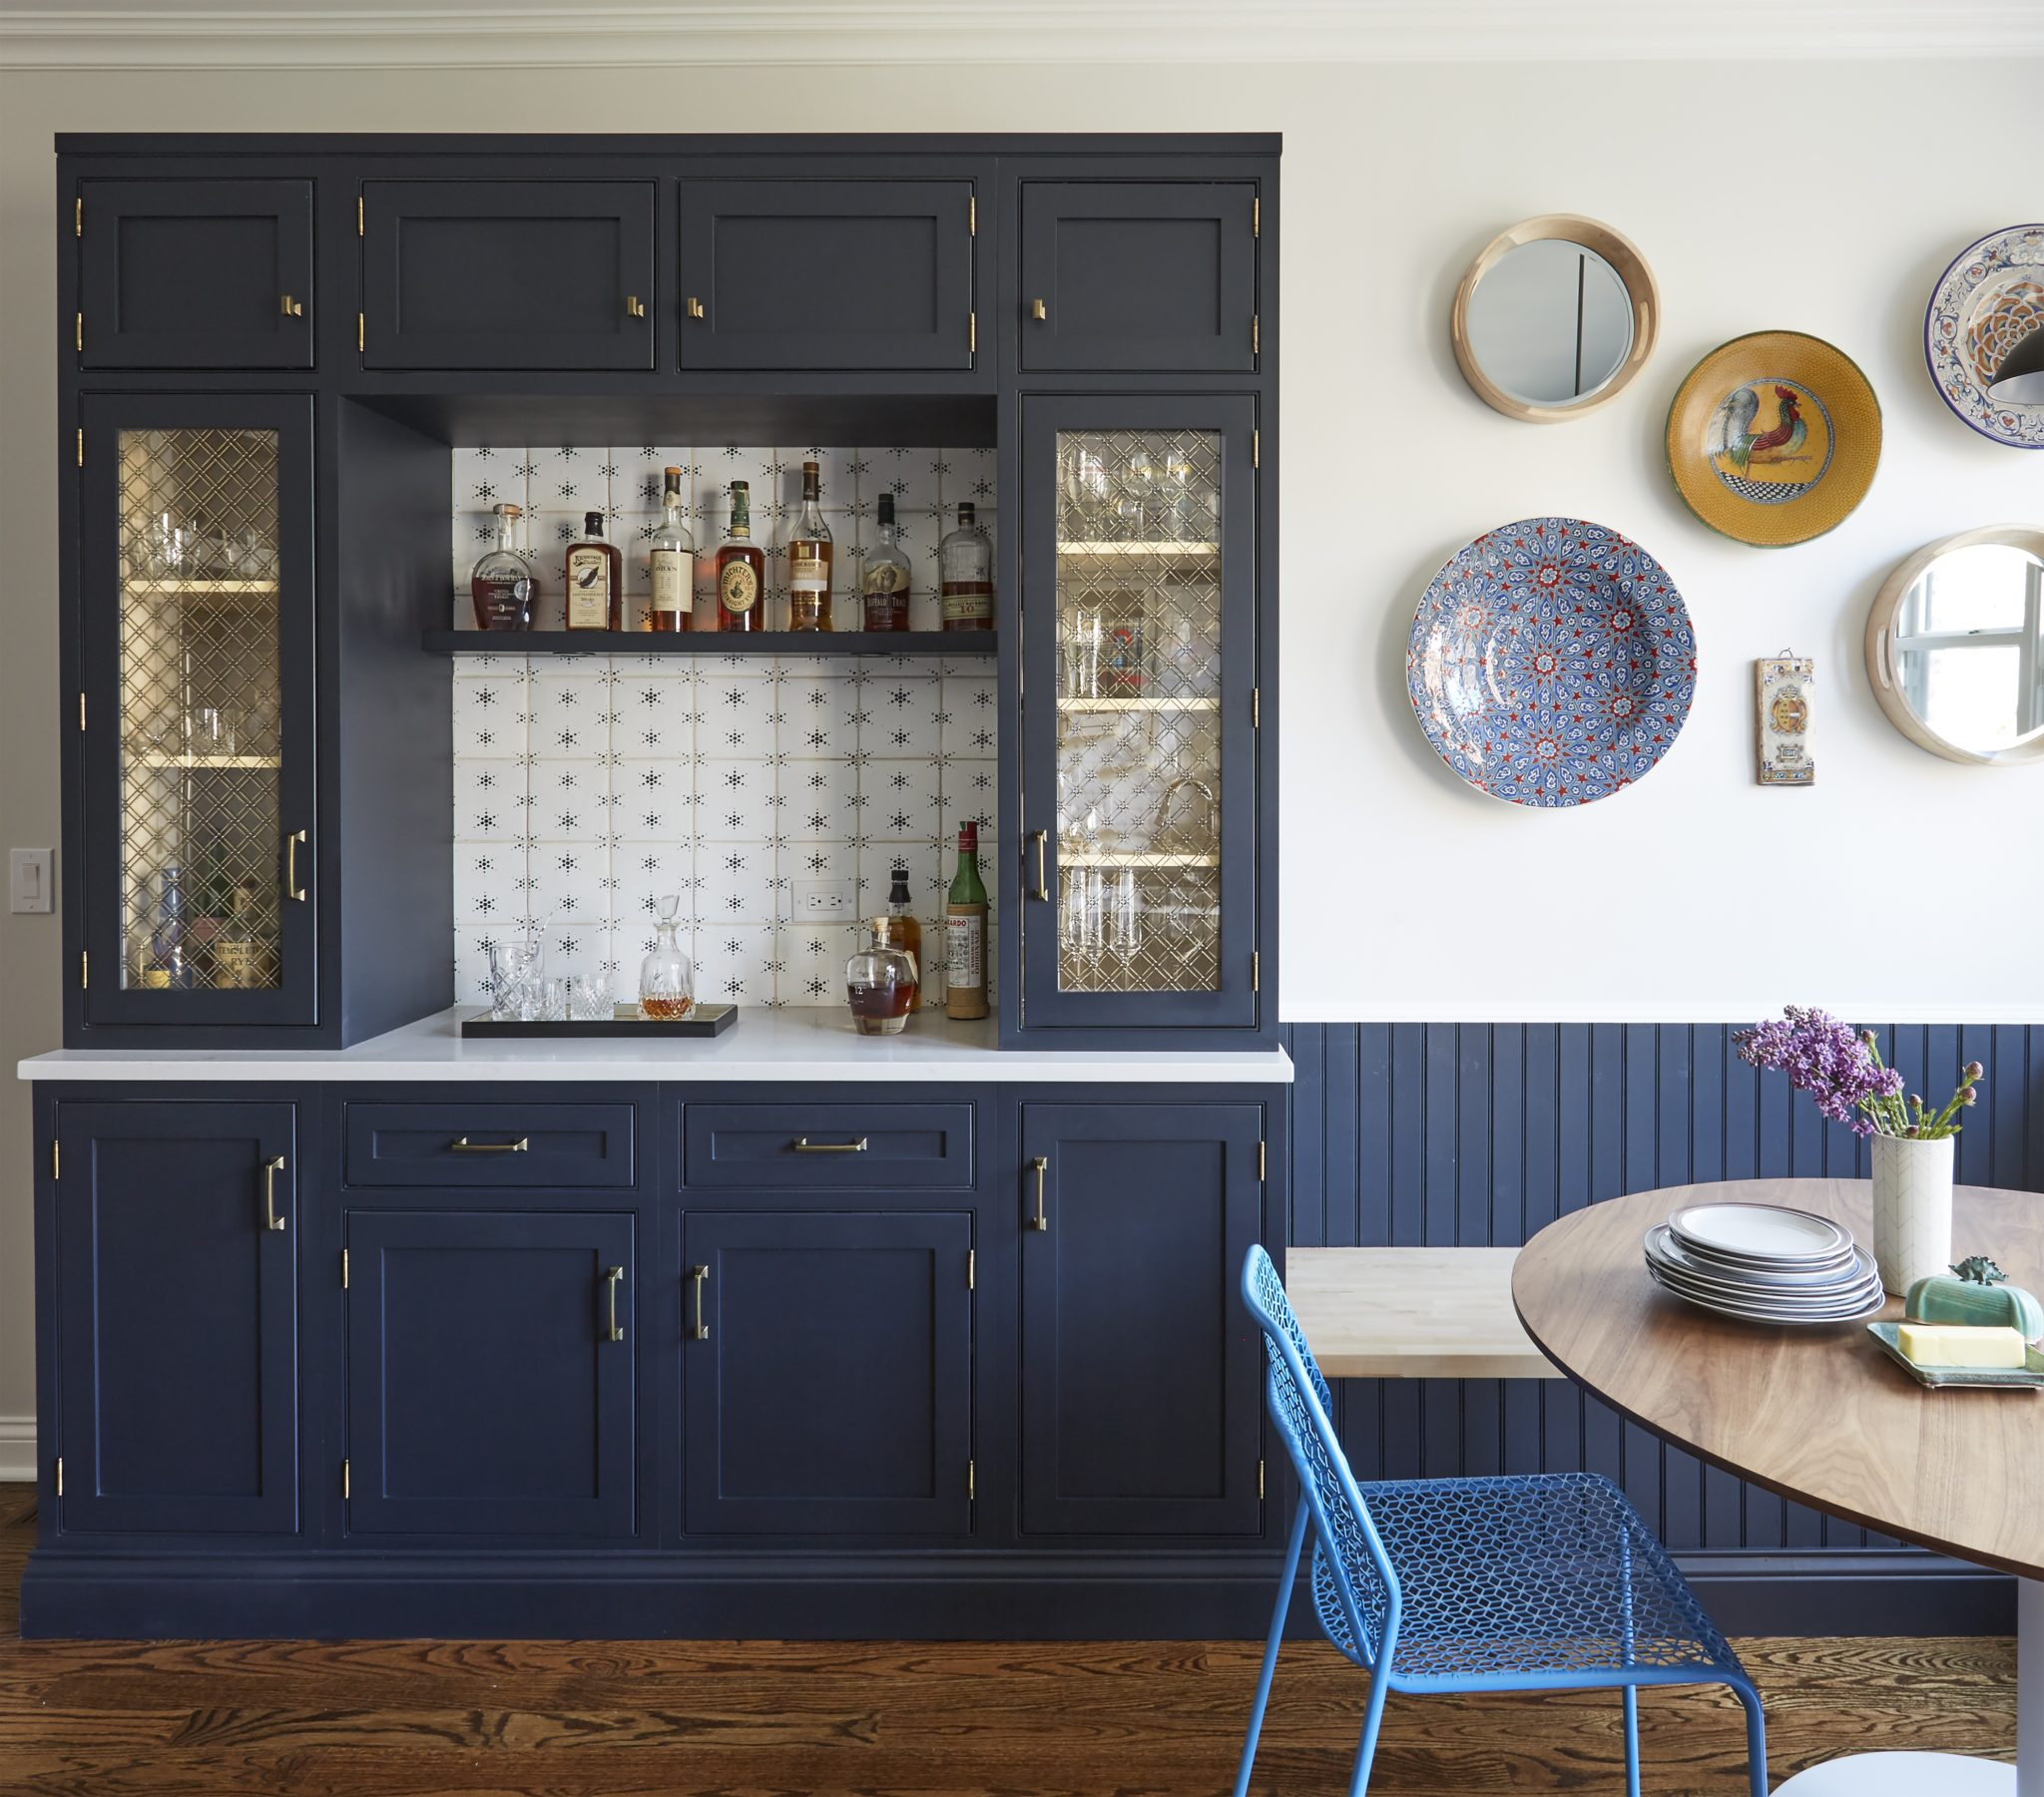 Walton {Chicago Residence} by KitchenLab Design | Rebekah Zaveloff Interiors